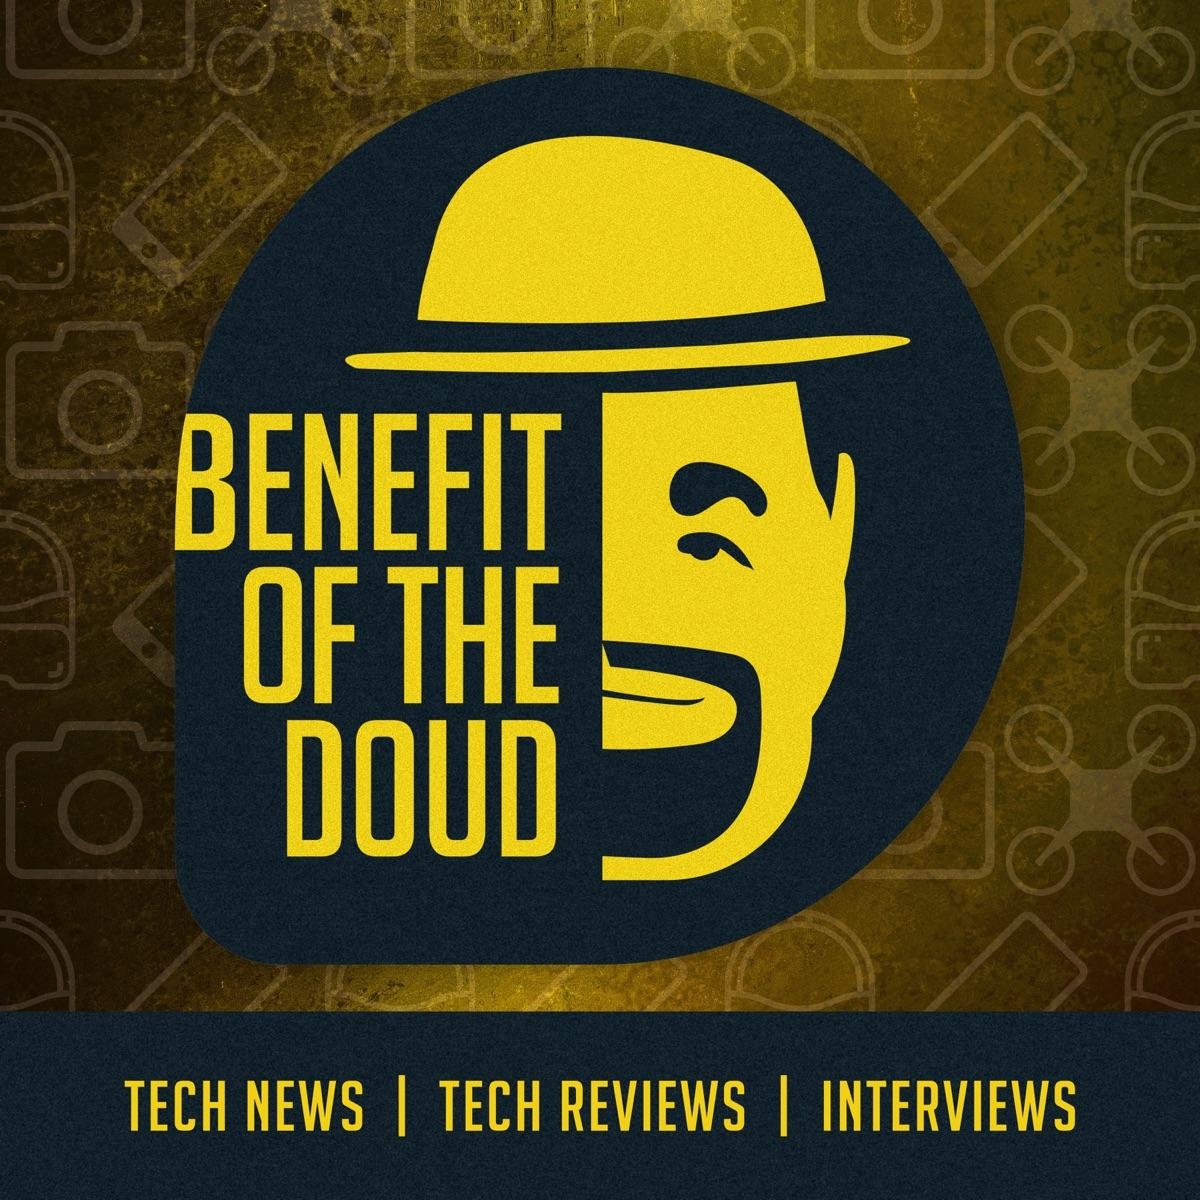 Benefit of the Doud